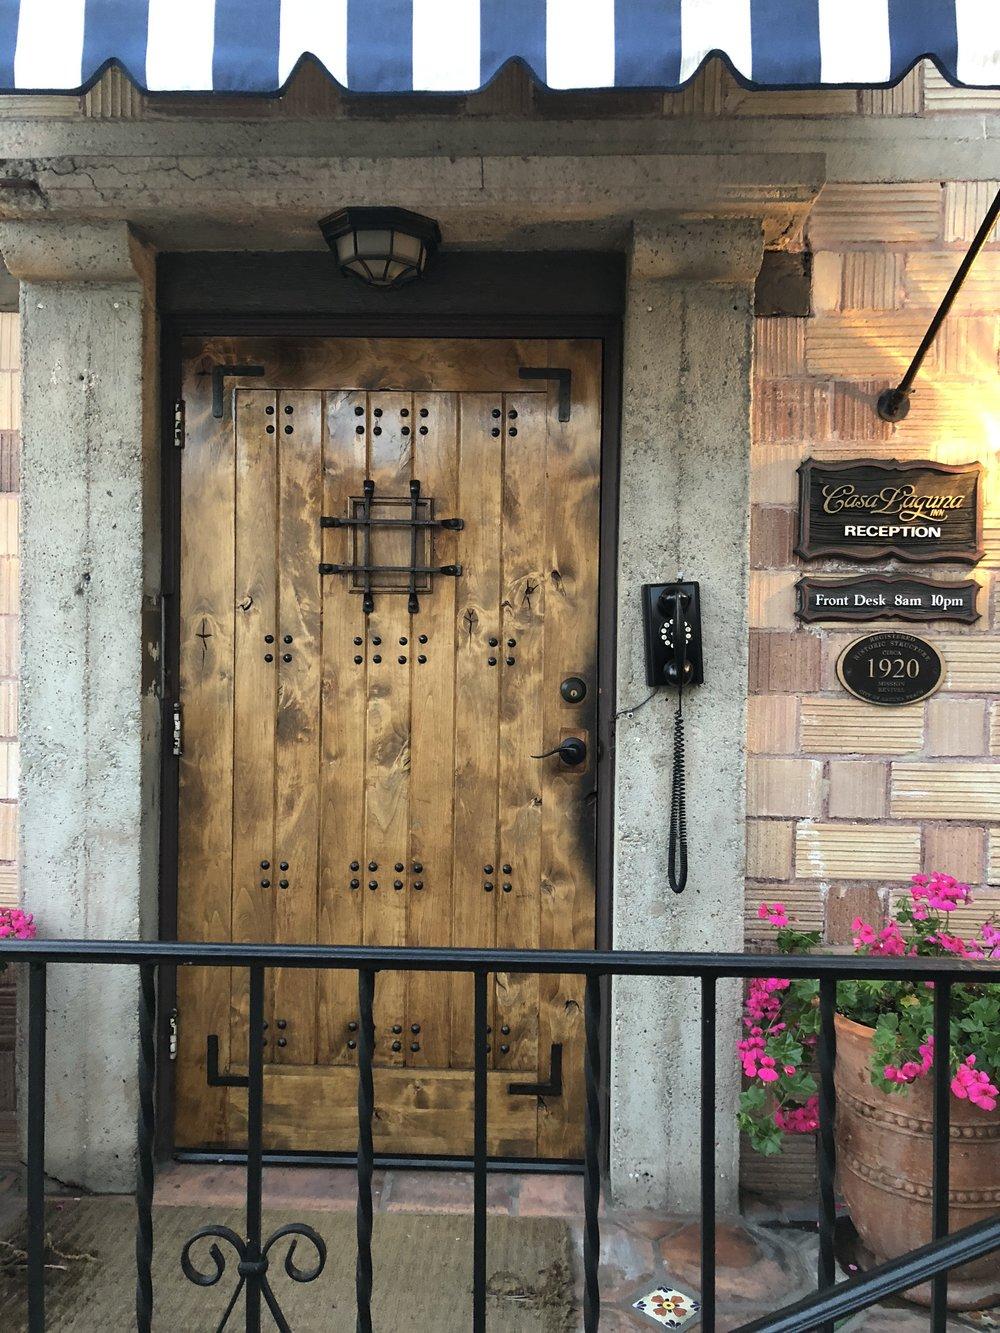 fitl-casa-lagunas-main-entrance.jpg